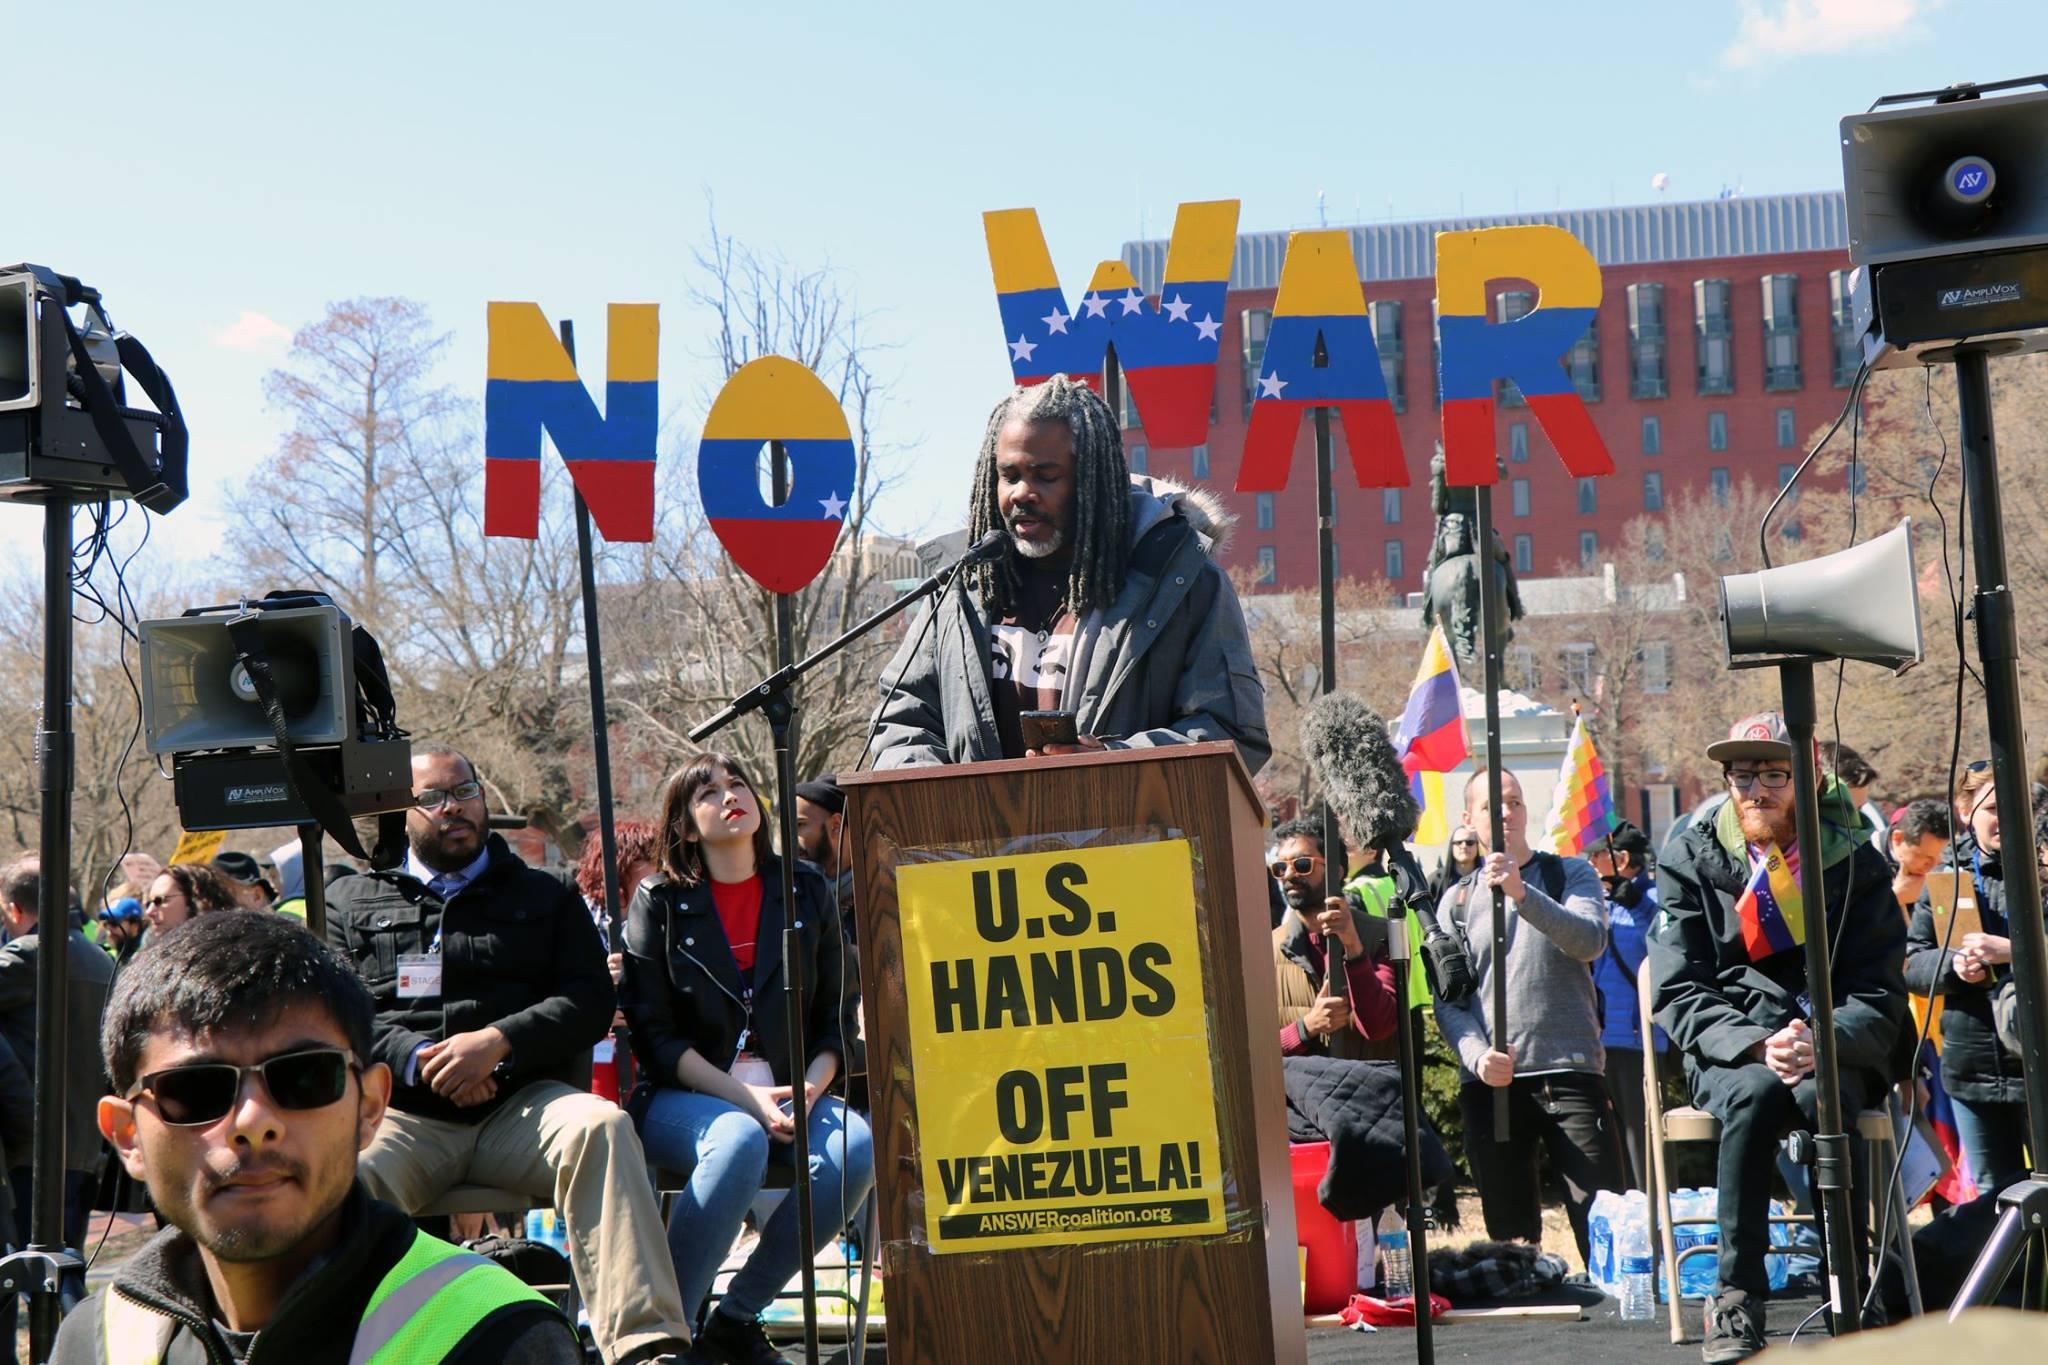 Netfa Freeman at National March on Washington, March 16, 2019